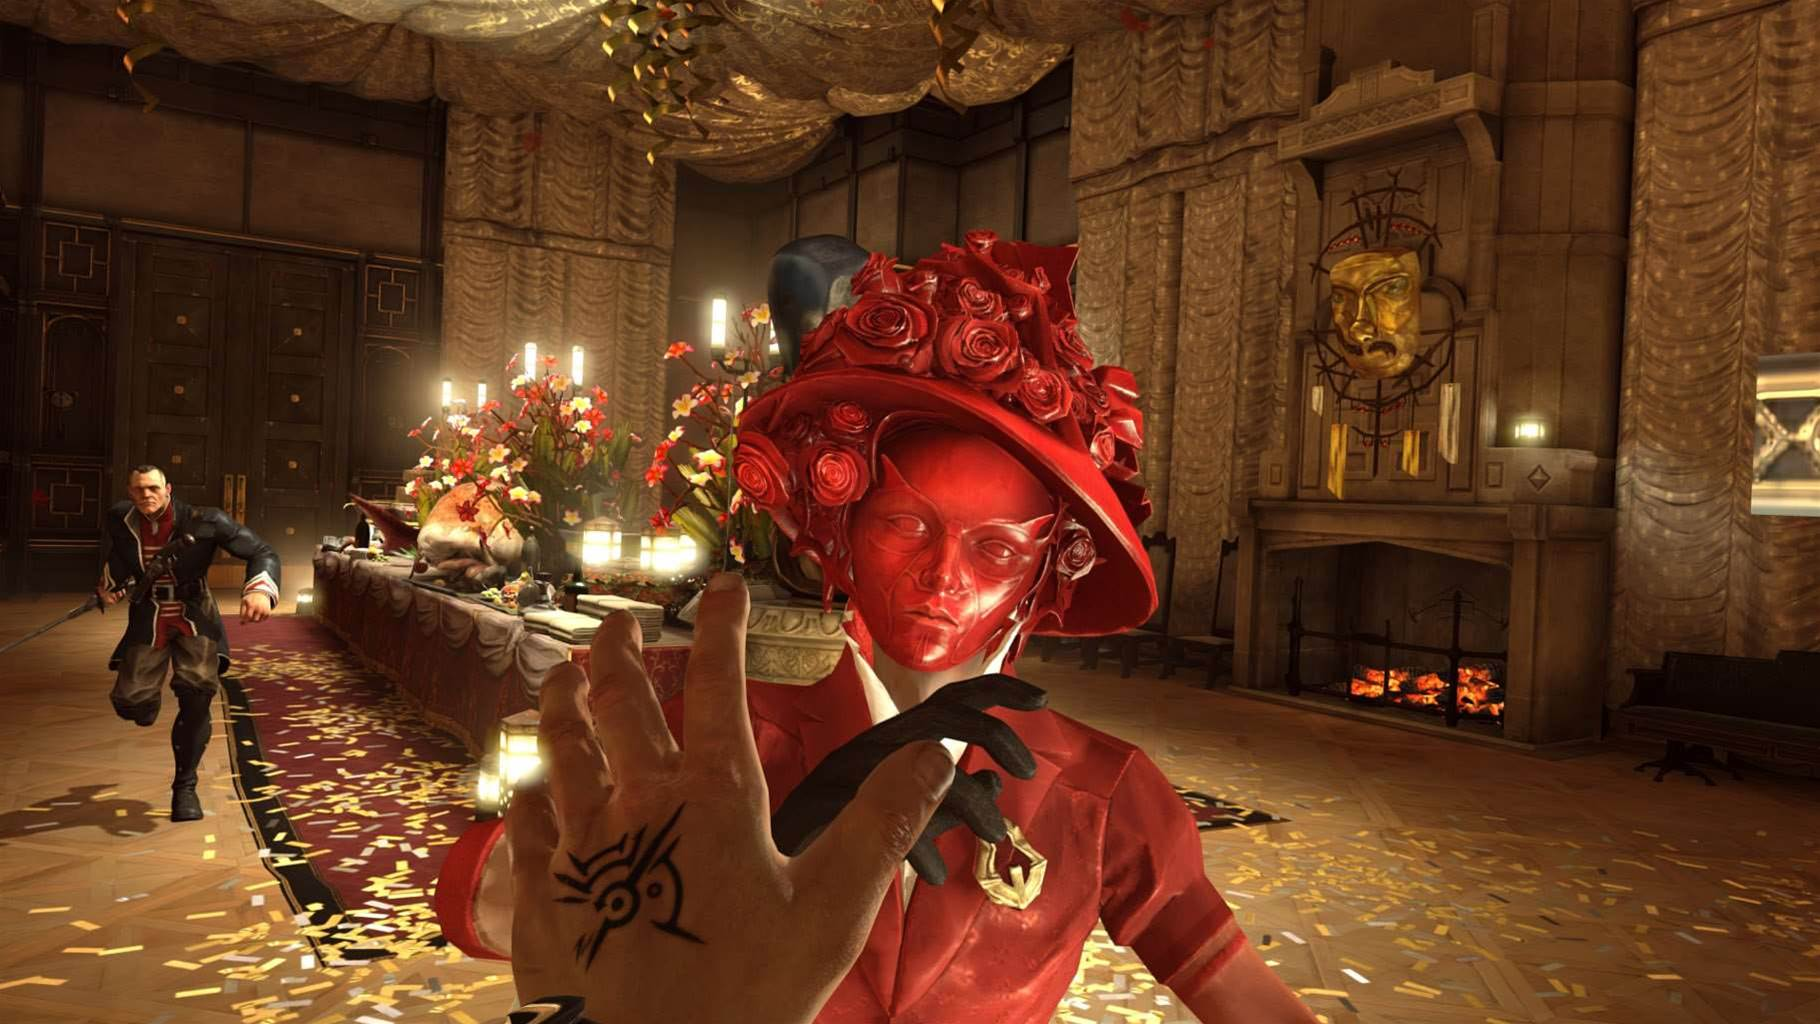 Brand new Dishonored screens, post-Quakecon 2012